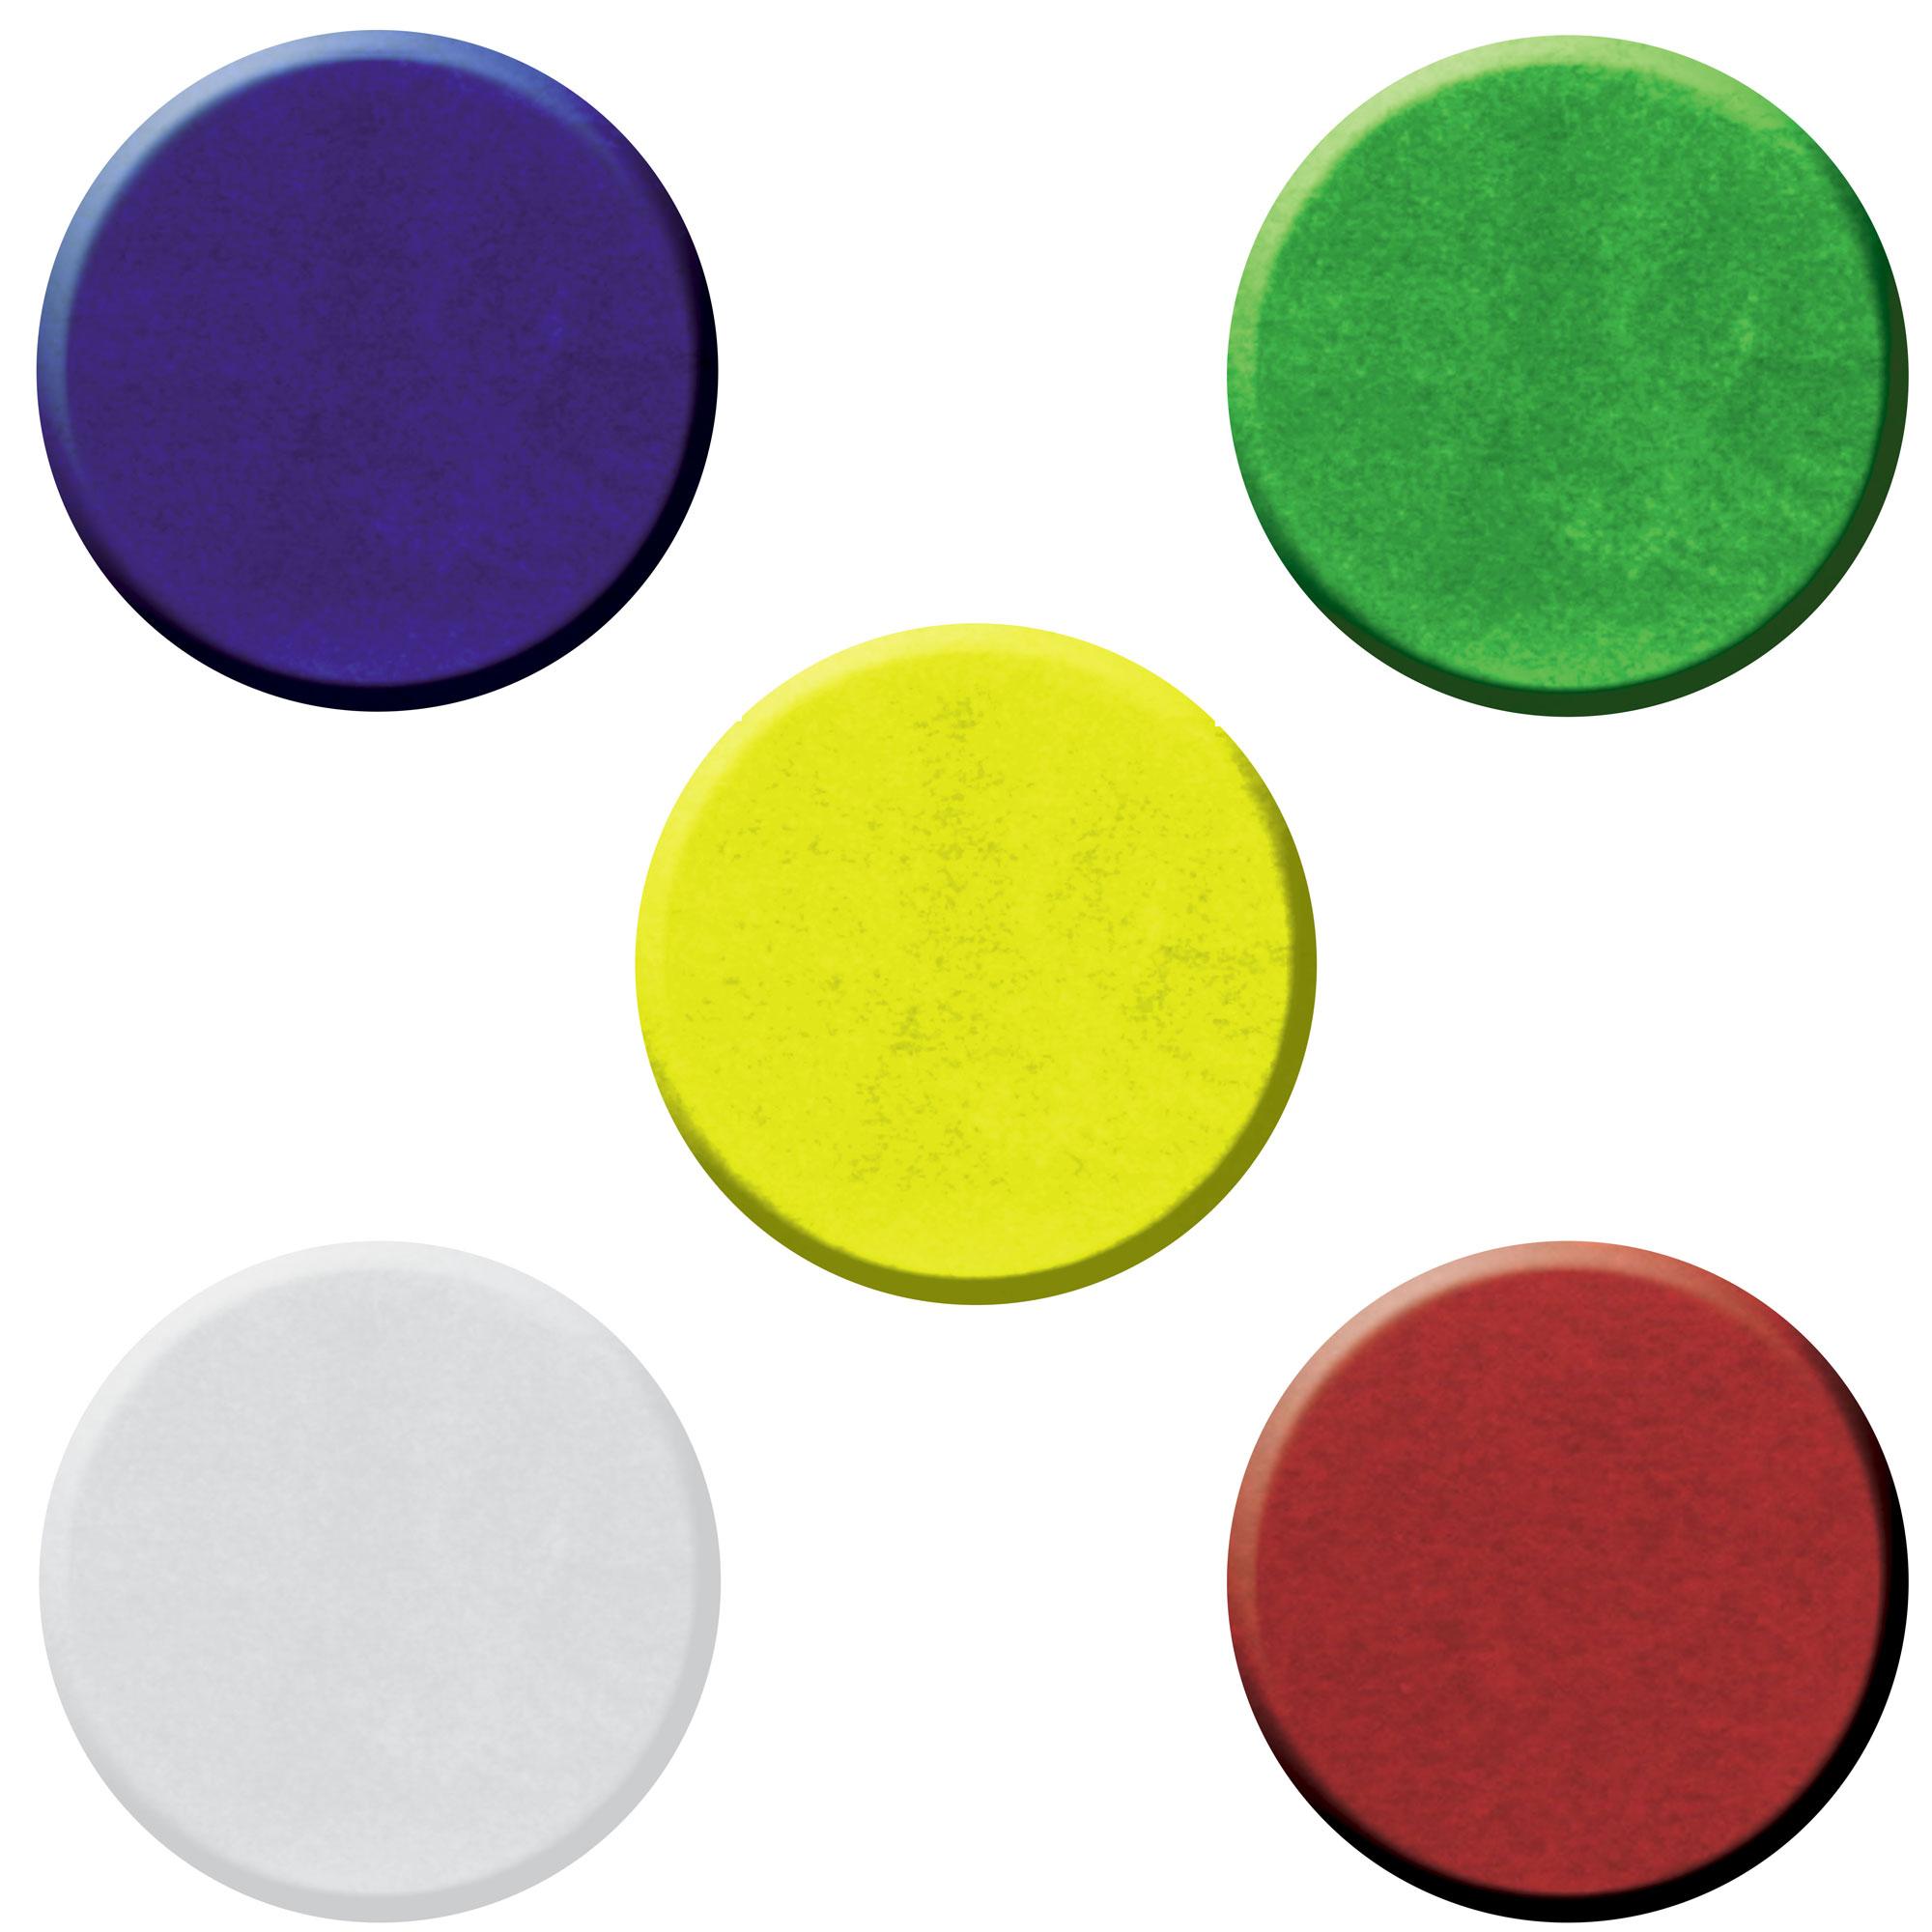 wachs farbpigment set farben kerzengiessen. Black Bedroom Furniture Sets. Home Design Ideas